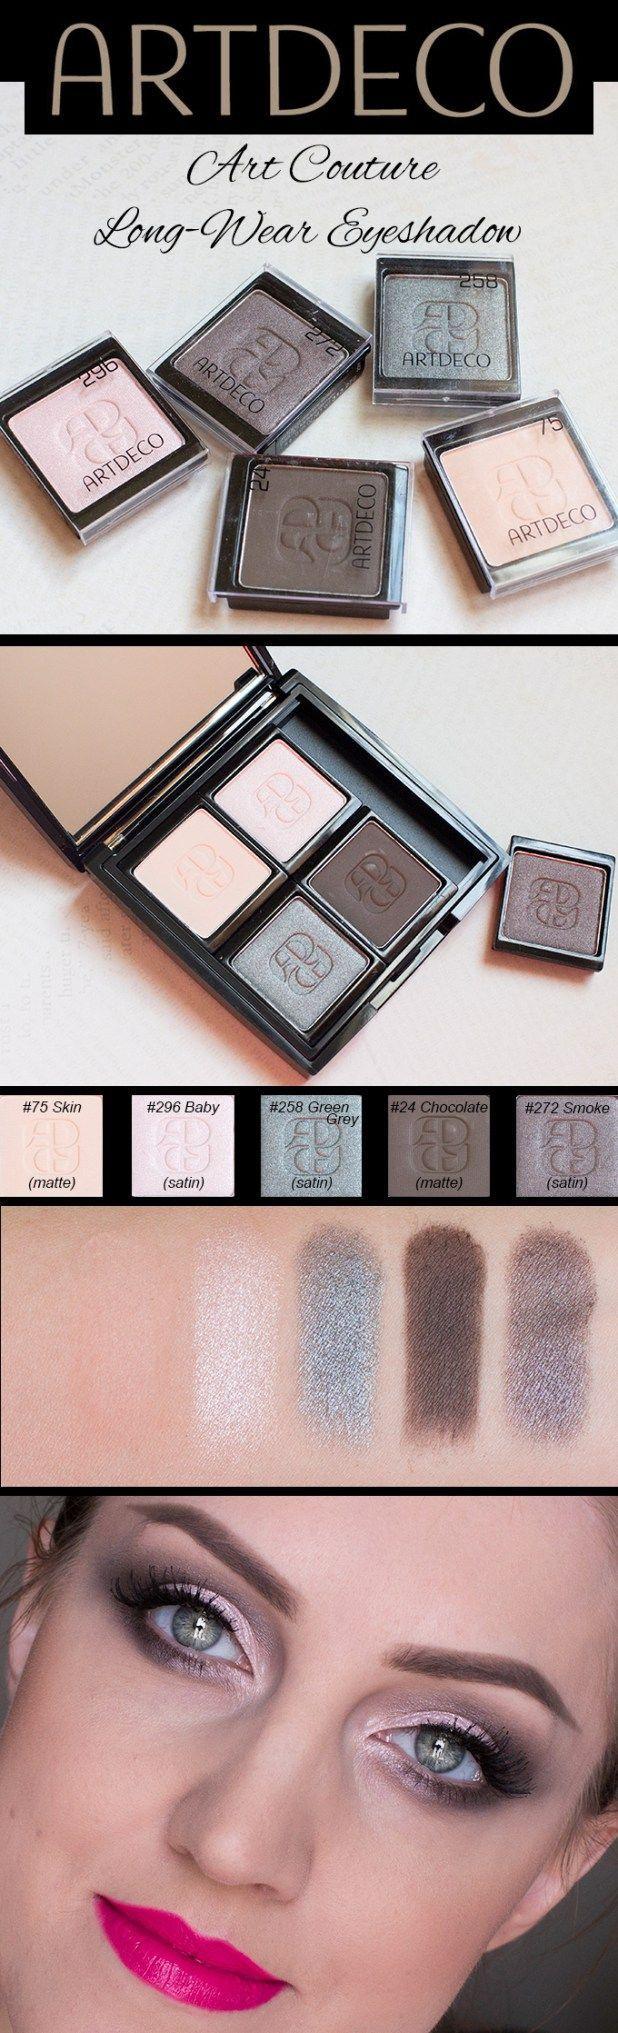 artdeco-art-couture-long-wear-eyeshadow